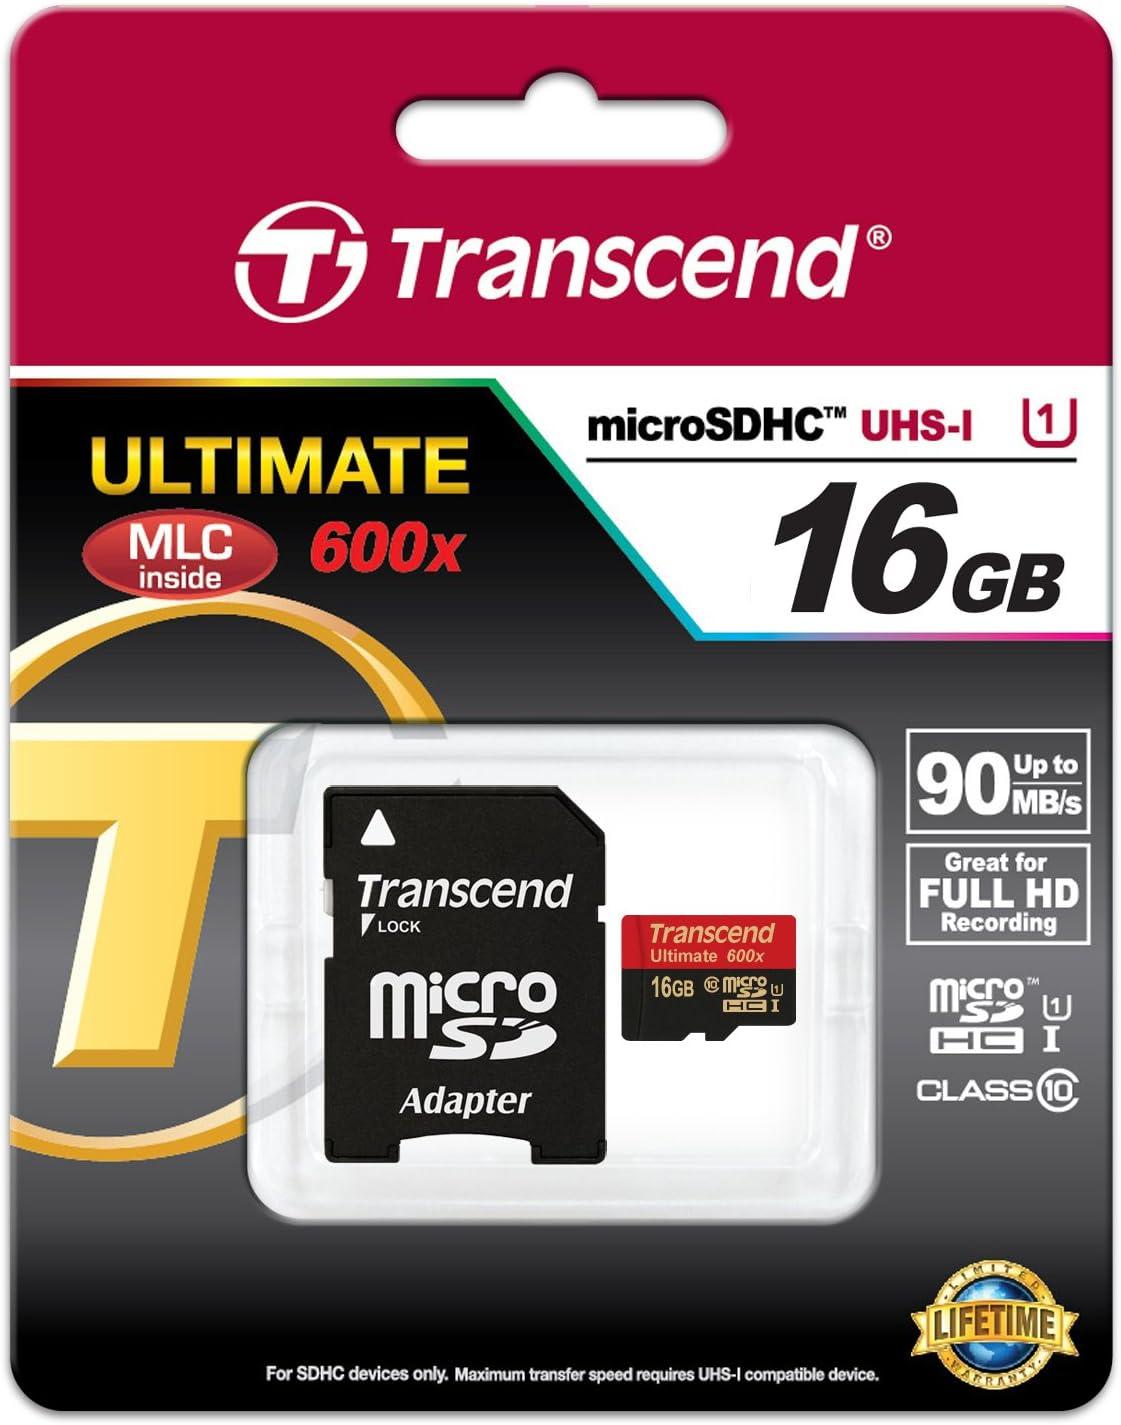 Transcend 8GB microSDXC//SDHC Class 10 UHS-I 600X Ultimate Memory Card